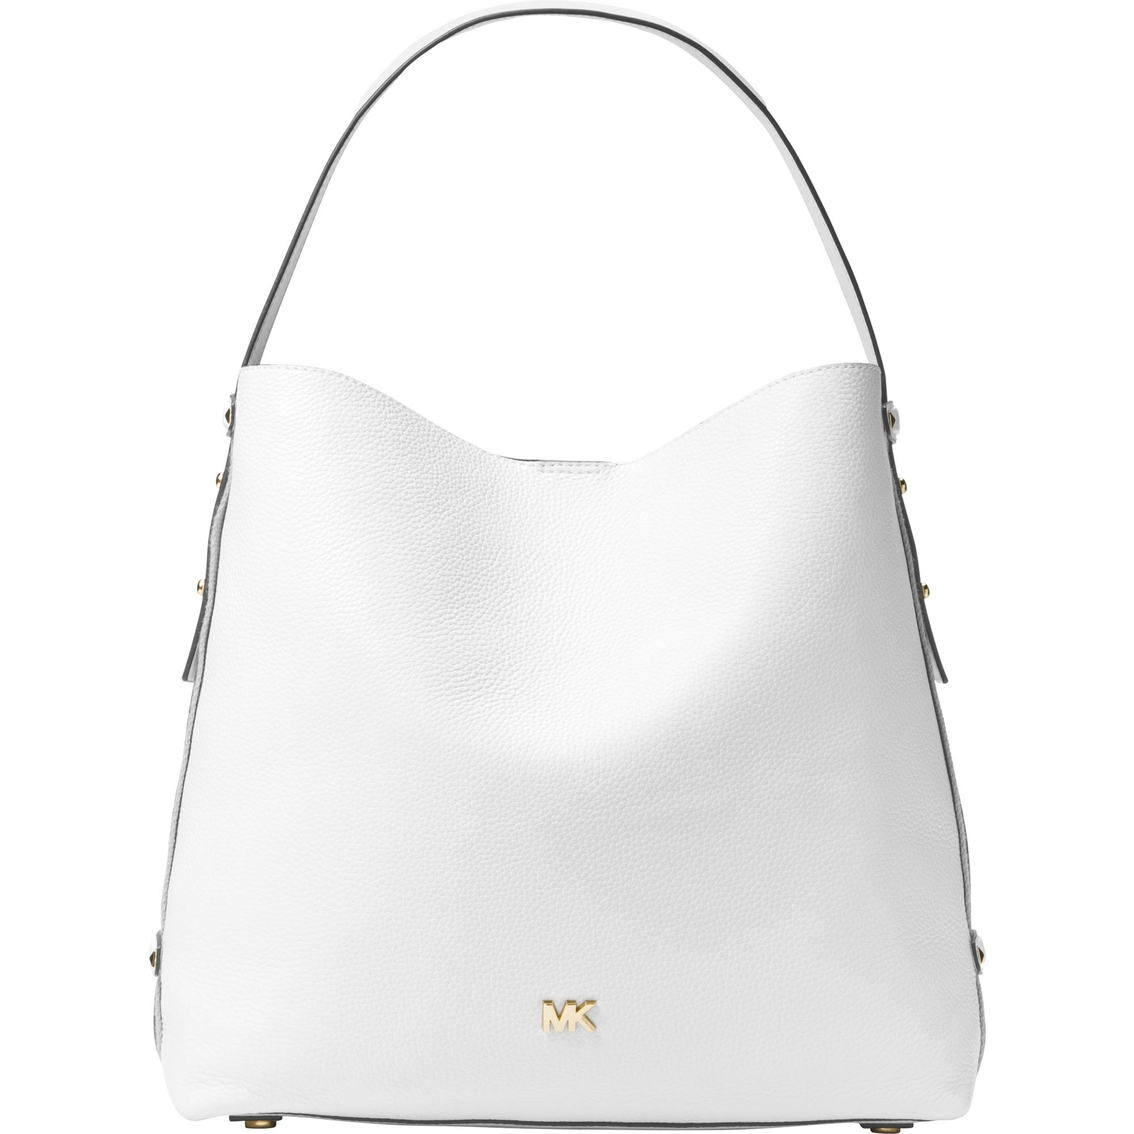 632a4c6d822f Michael Kors Griffin Large Top Zip Hobo Shoulder Bag | Handbags ...